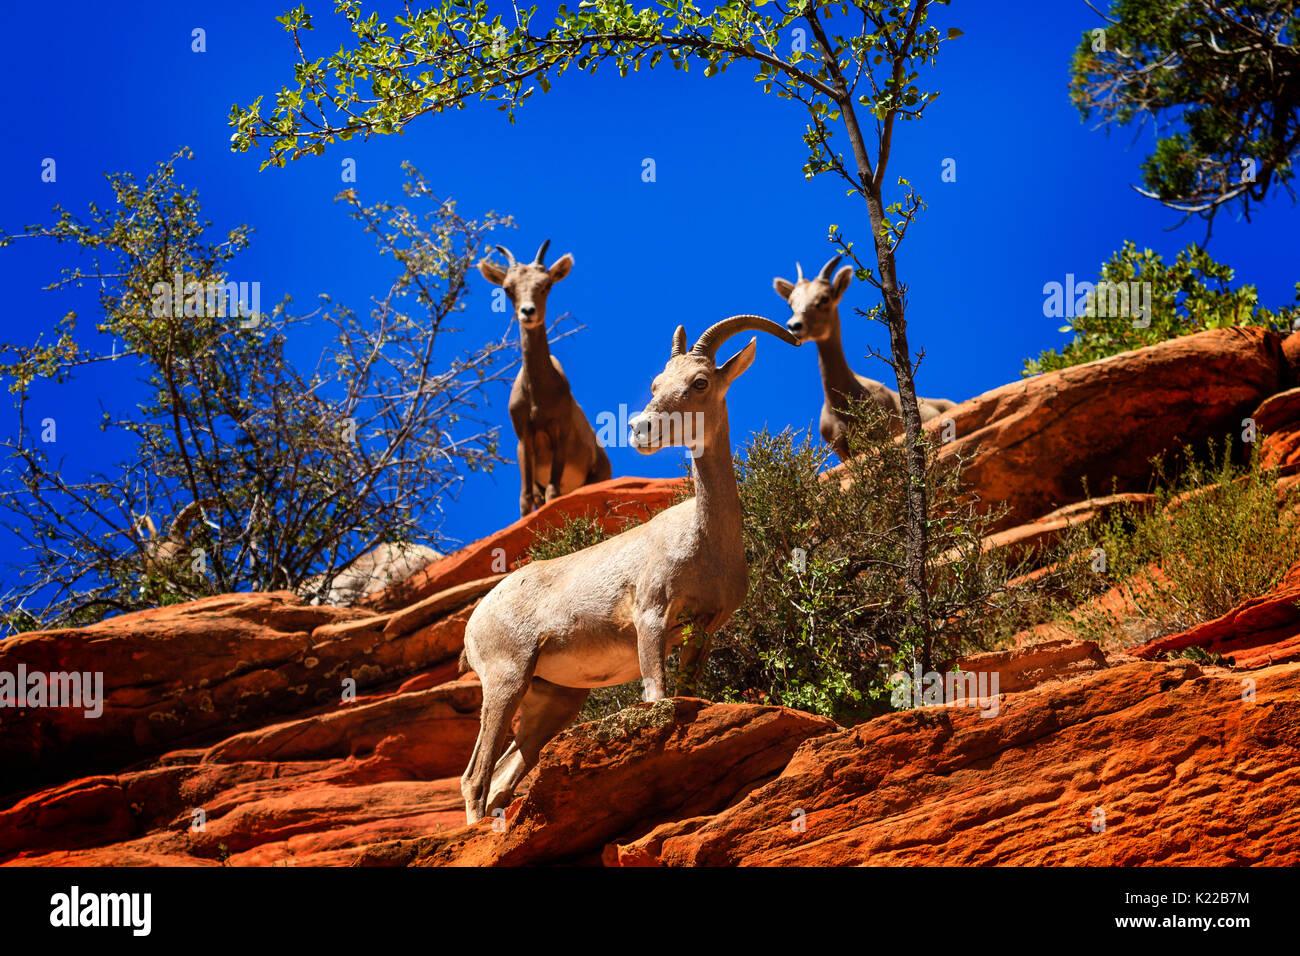 Zion National Park Desert Sheep - Stock Image